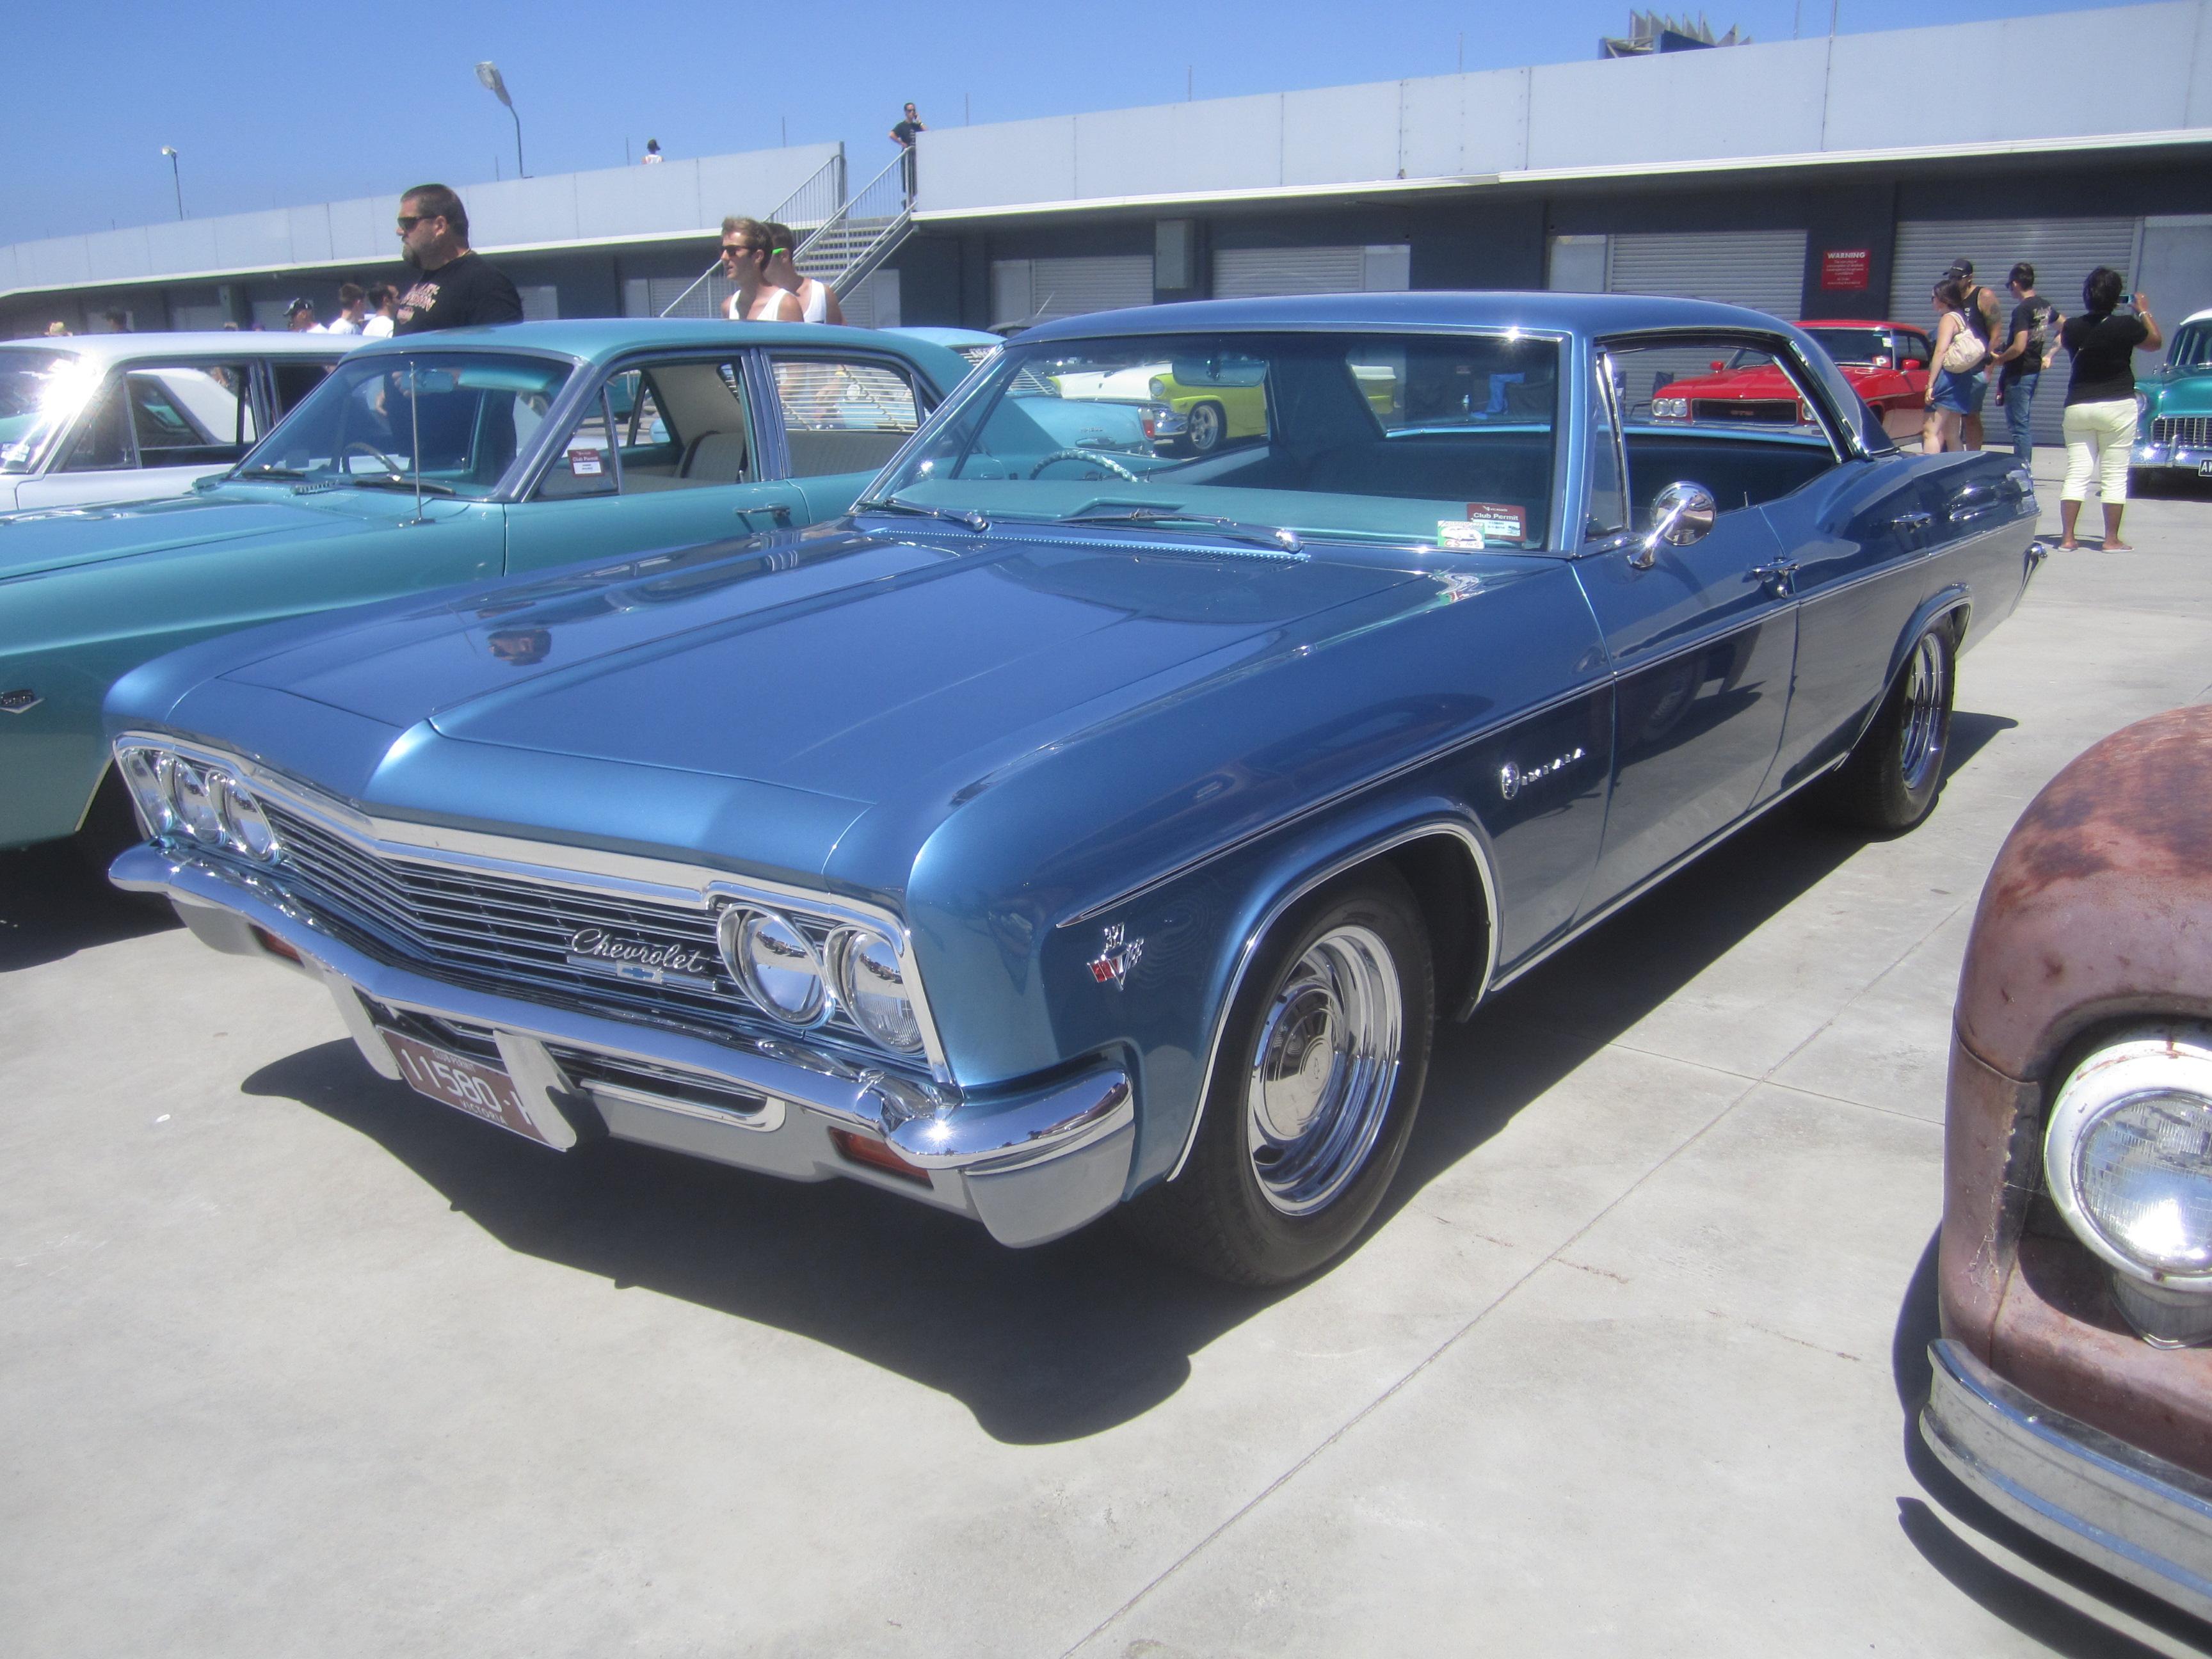 File1966 Chevrolet Impala 4 Door Hardtop 8473278454 1966 Chevy Convertible